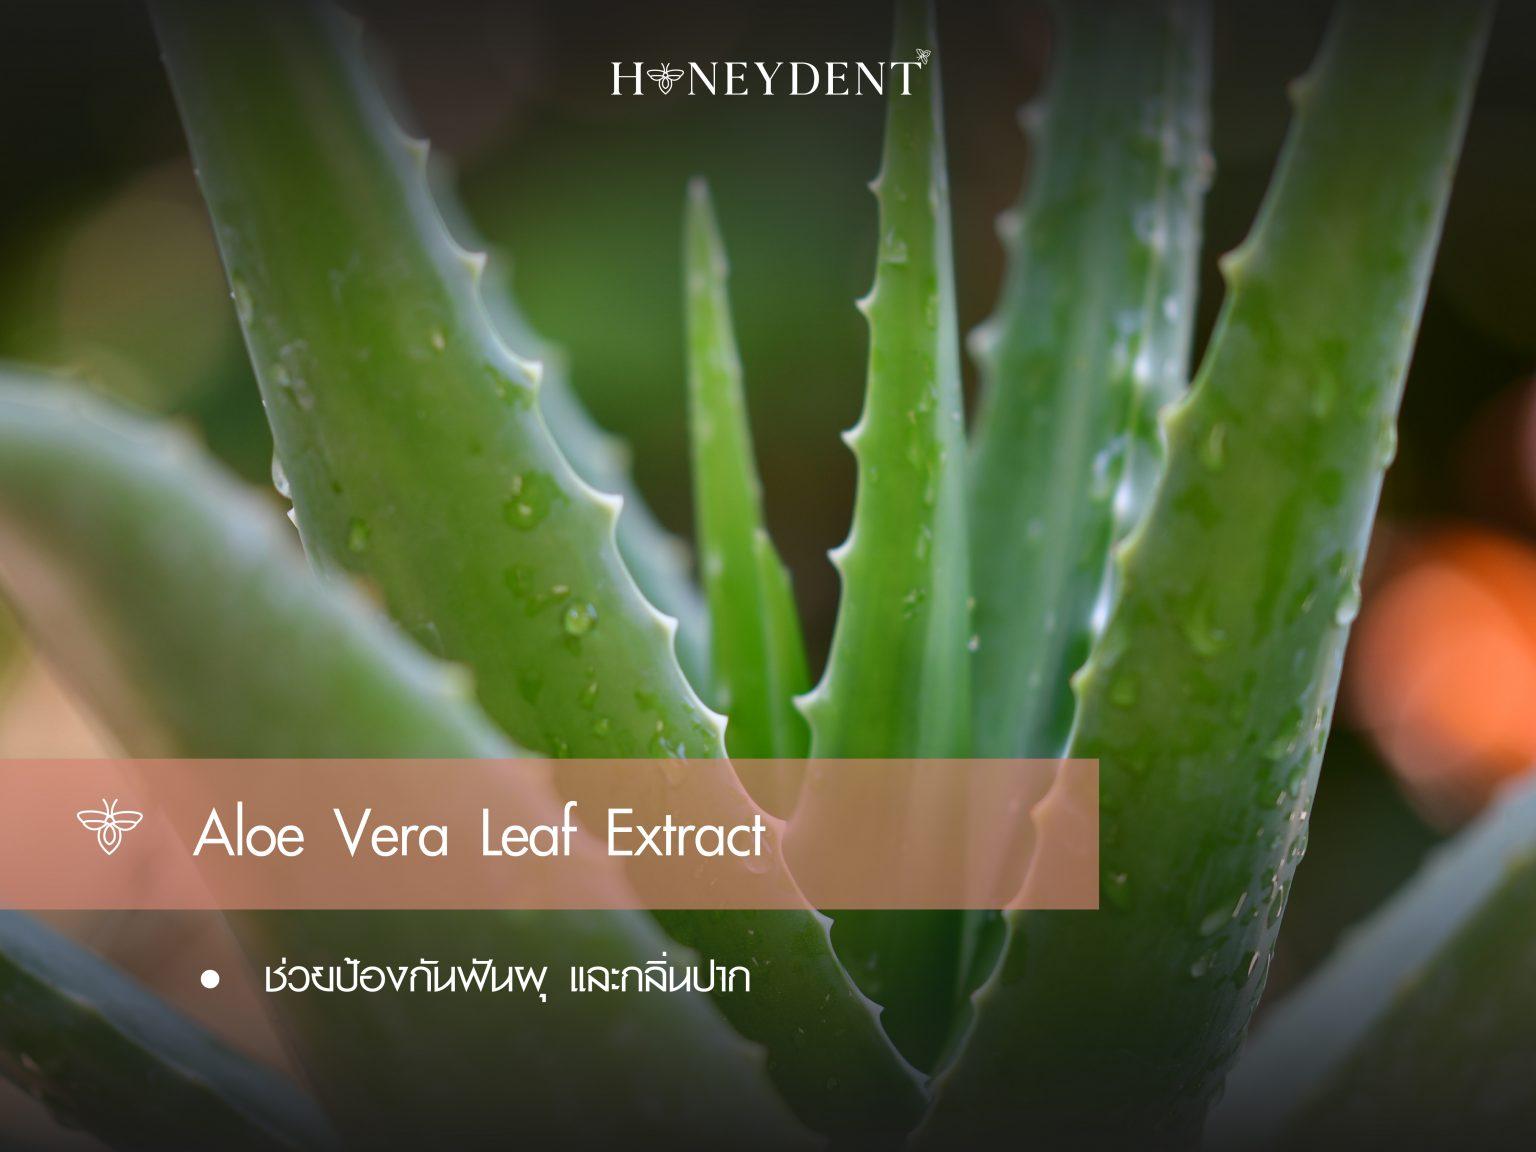 Aloe vera leaf extract